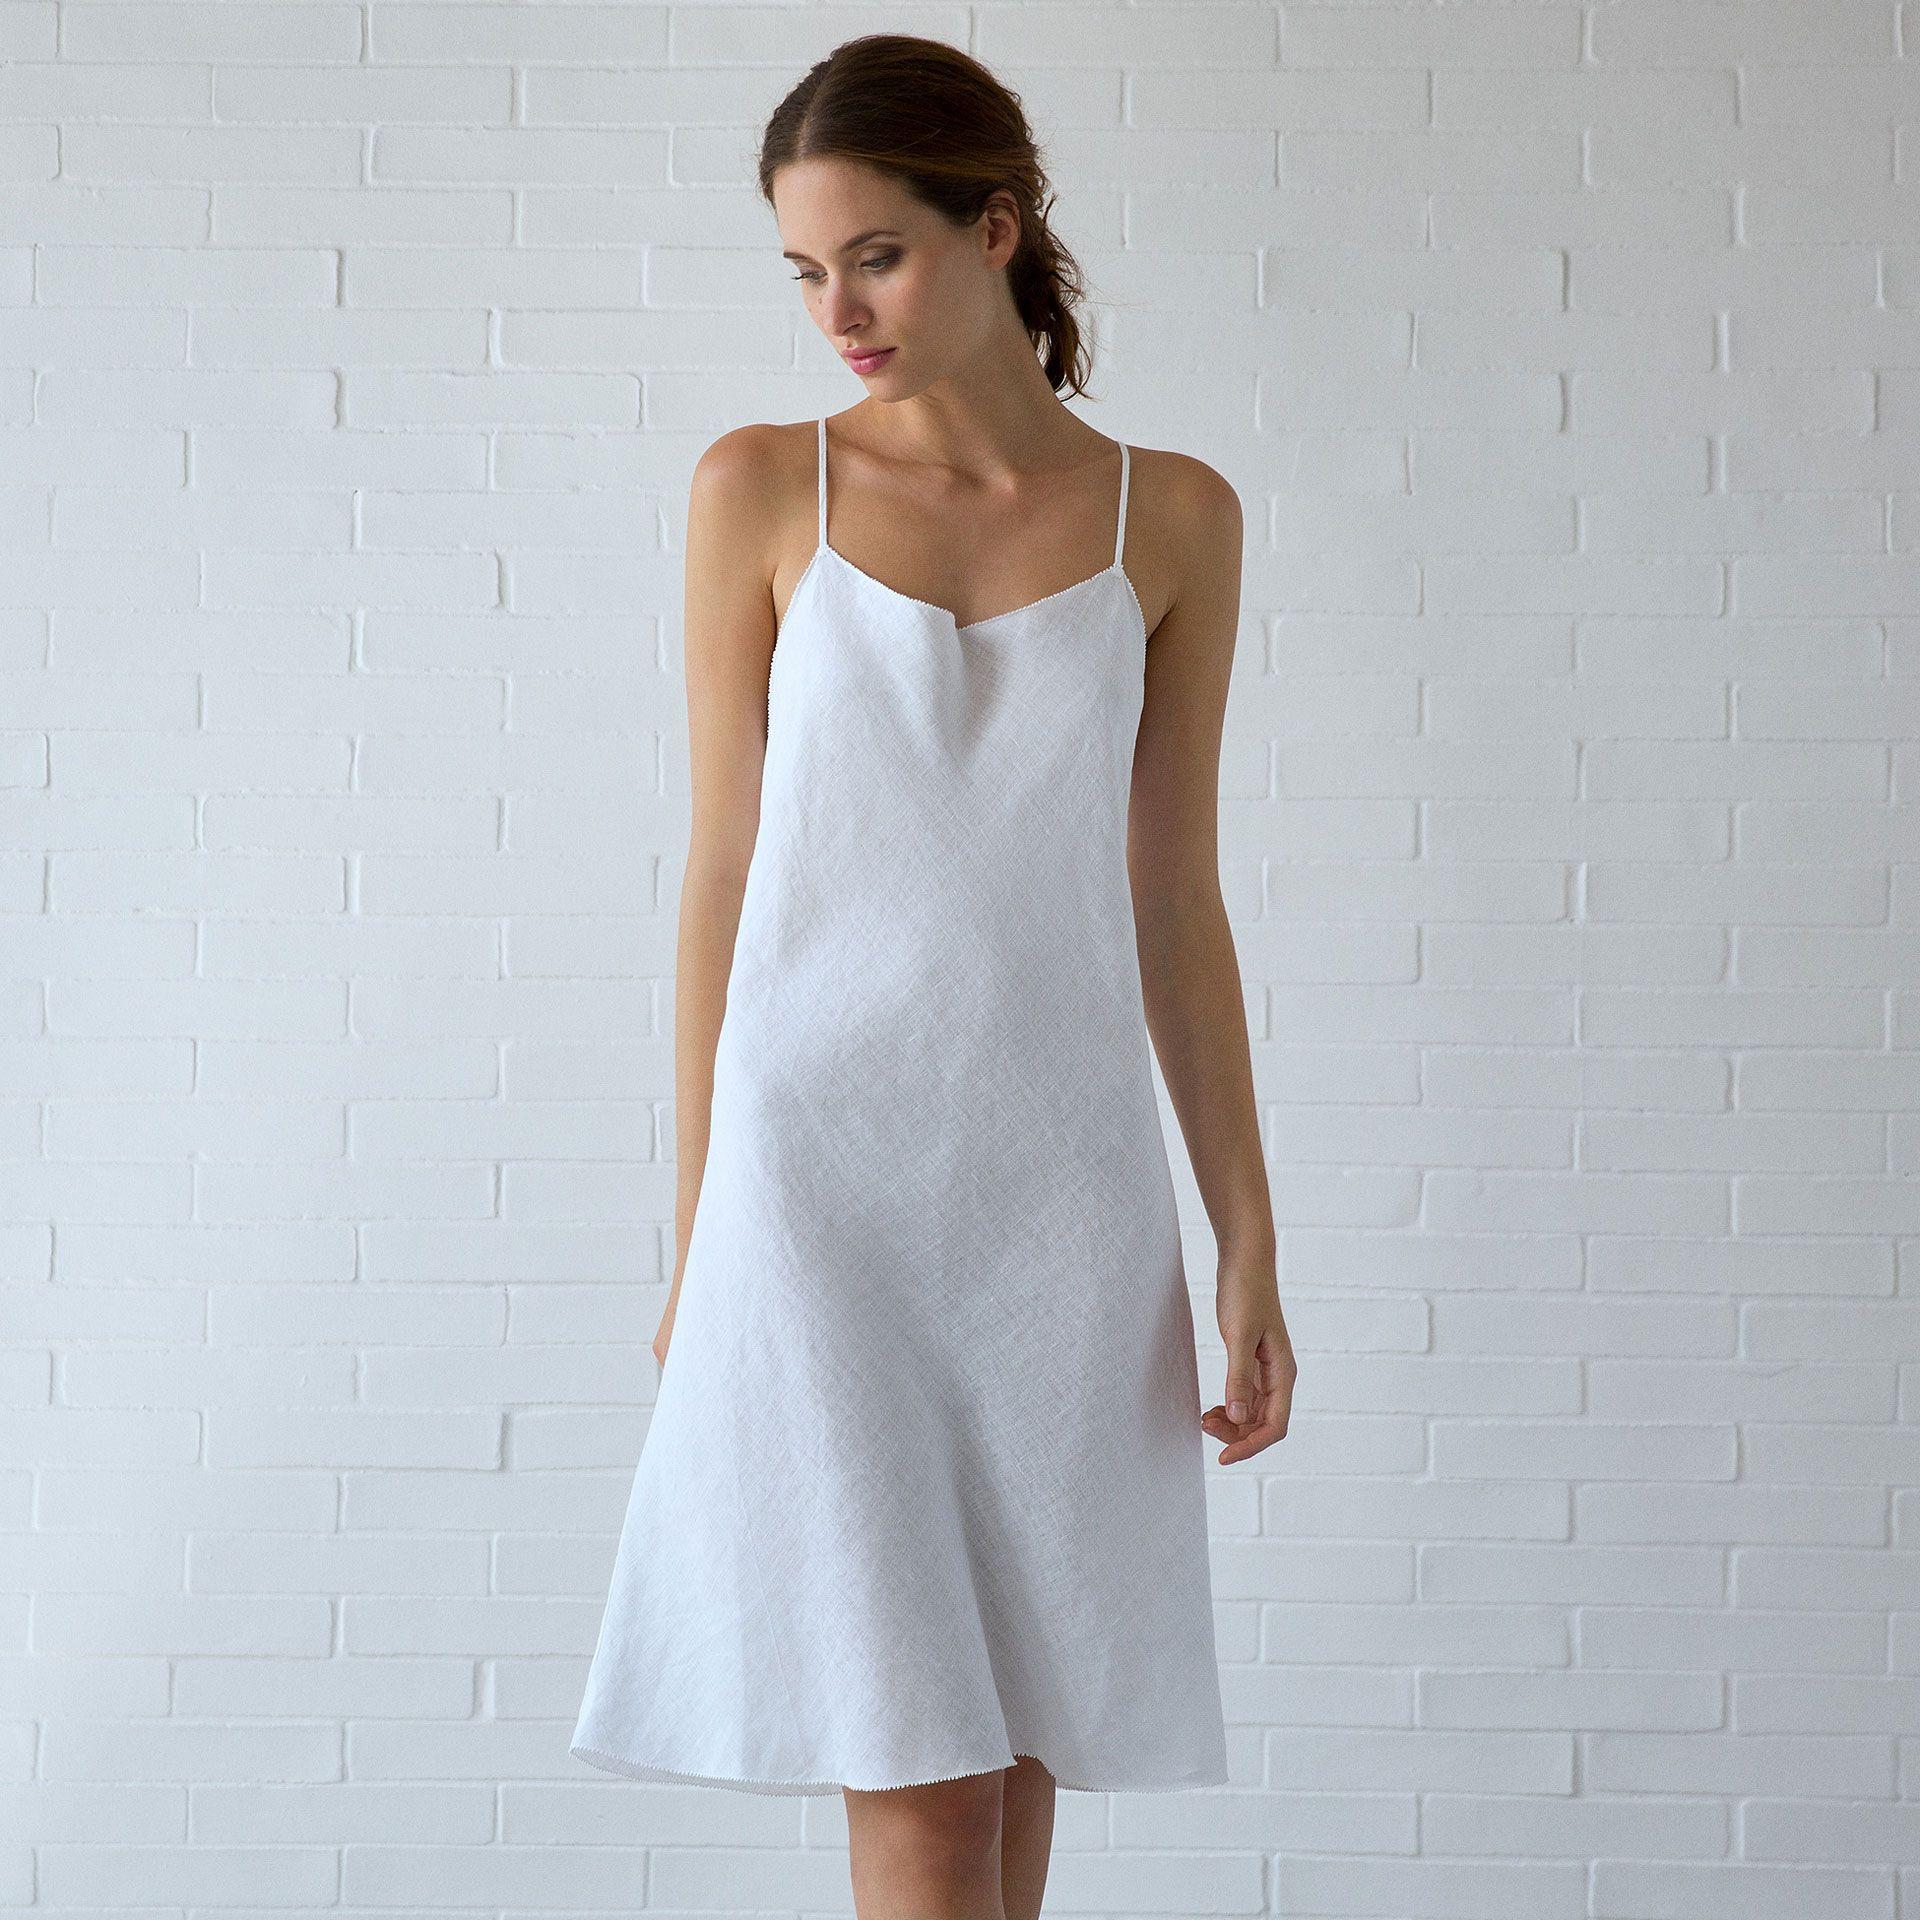 locker gestricktes nachthemd aus leinen in wei nachthemden women 39 s homewear homewear. Black Bedroom Furniture Sets. Home Design Ideas